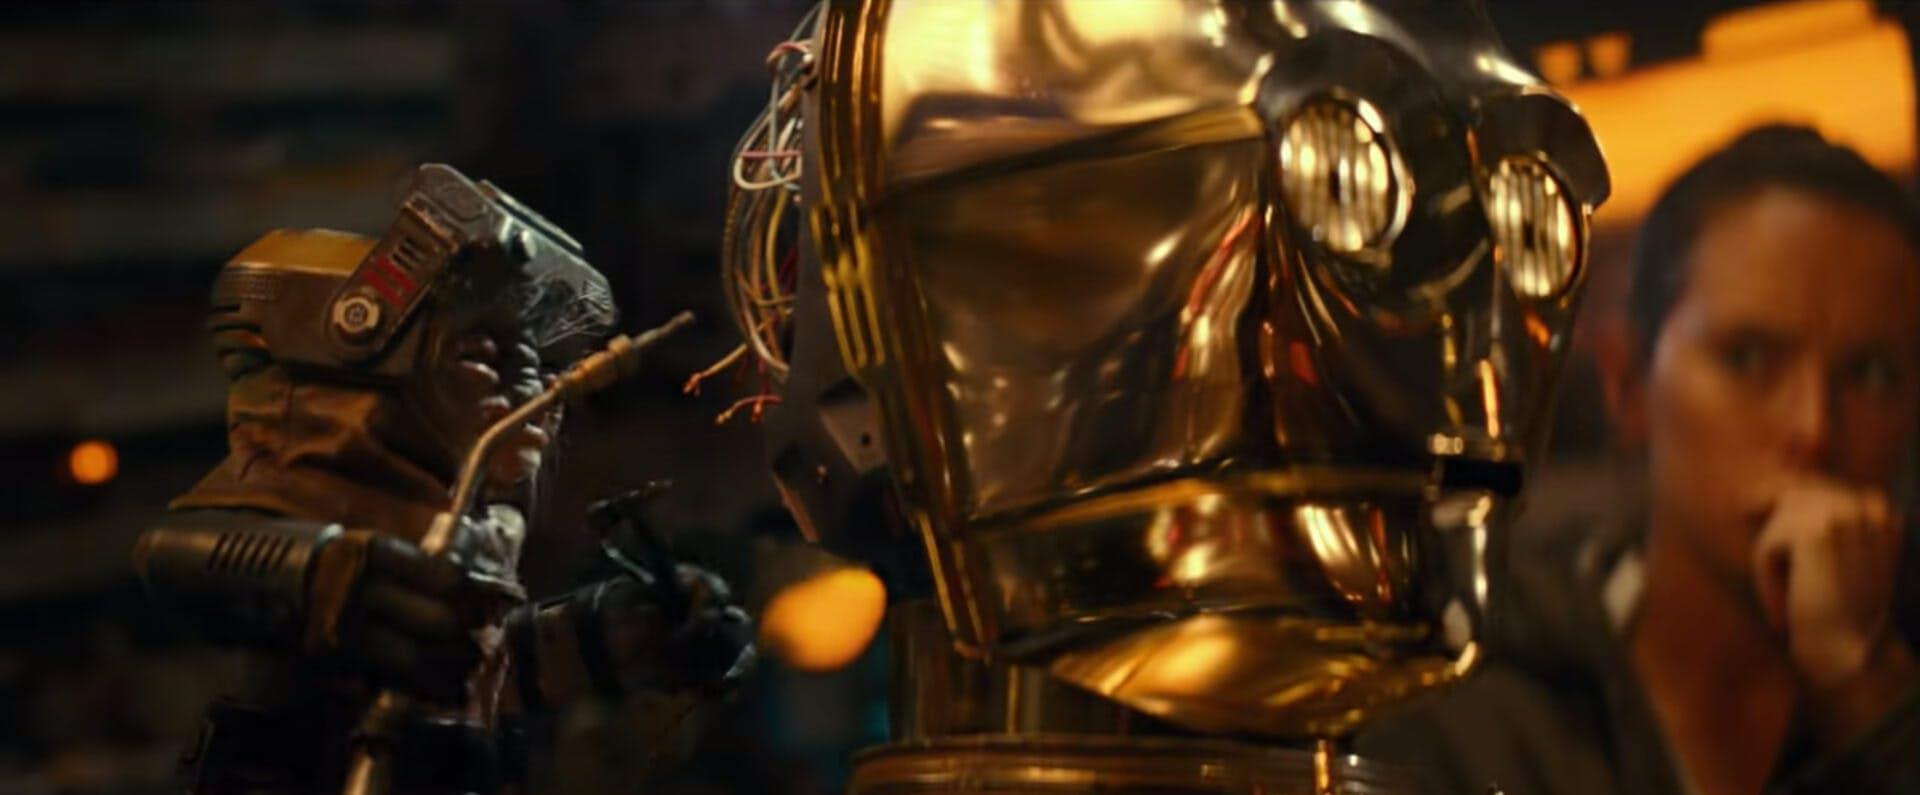 Babu Frik - C-3PO